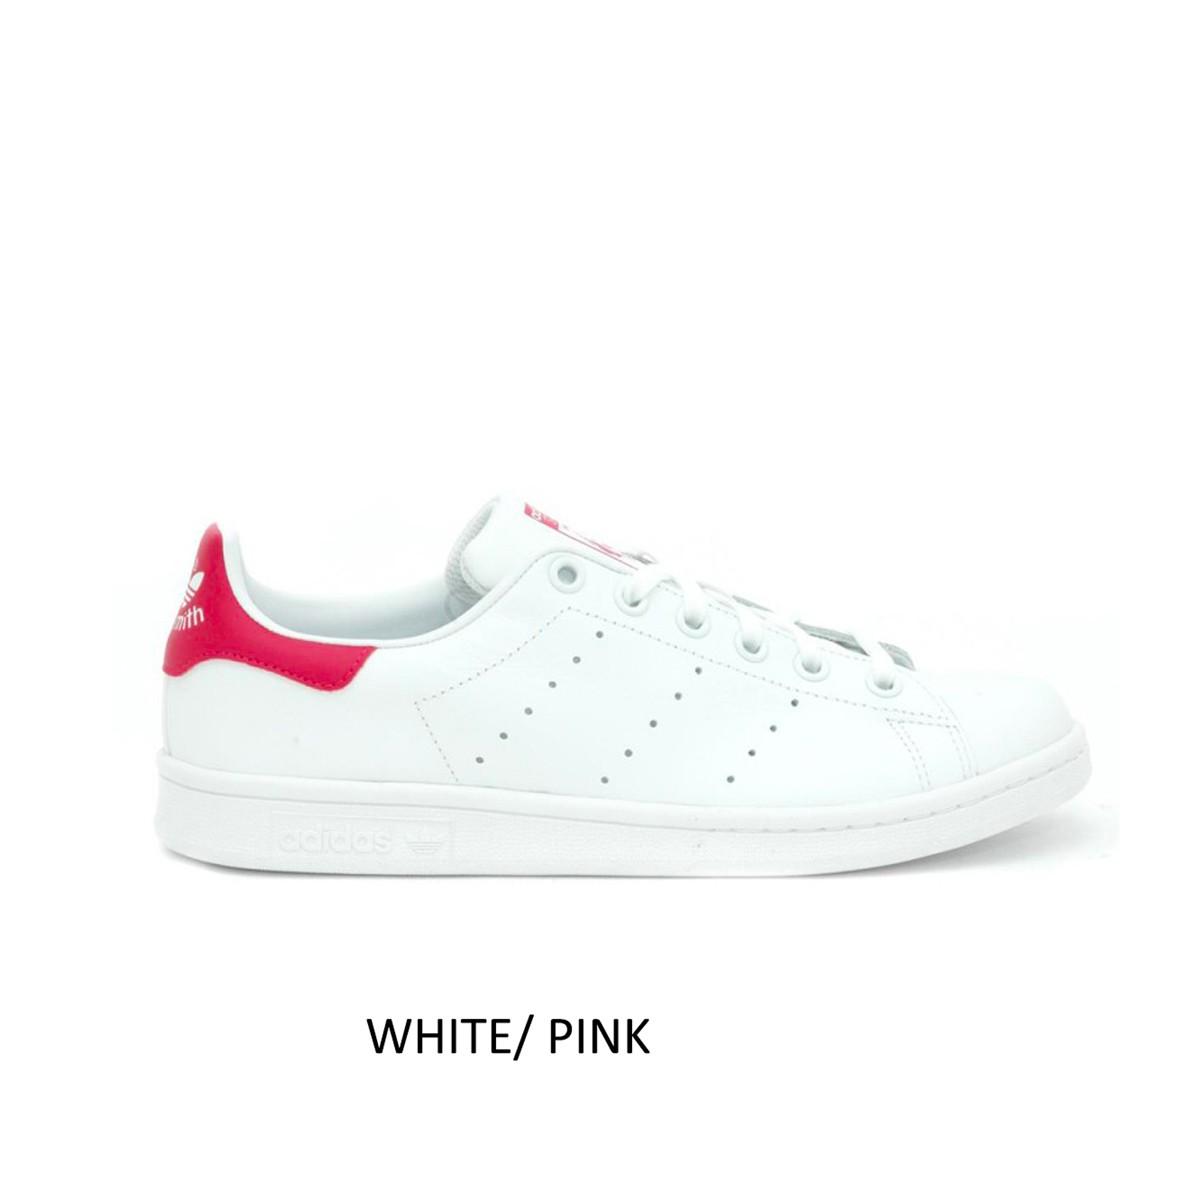 Adisas Stan Smith Pink con Strass Preciosa Shop Online